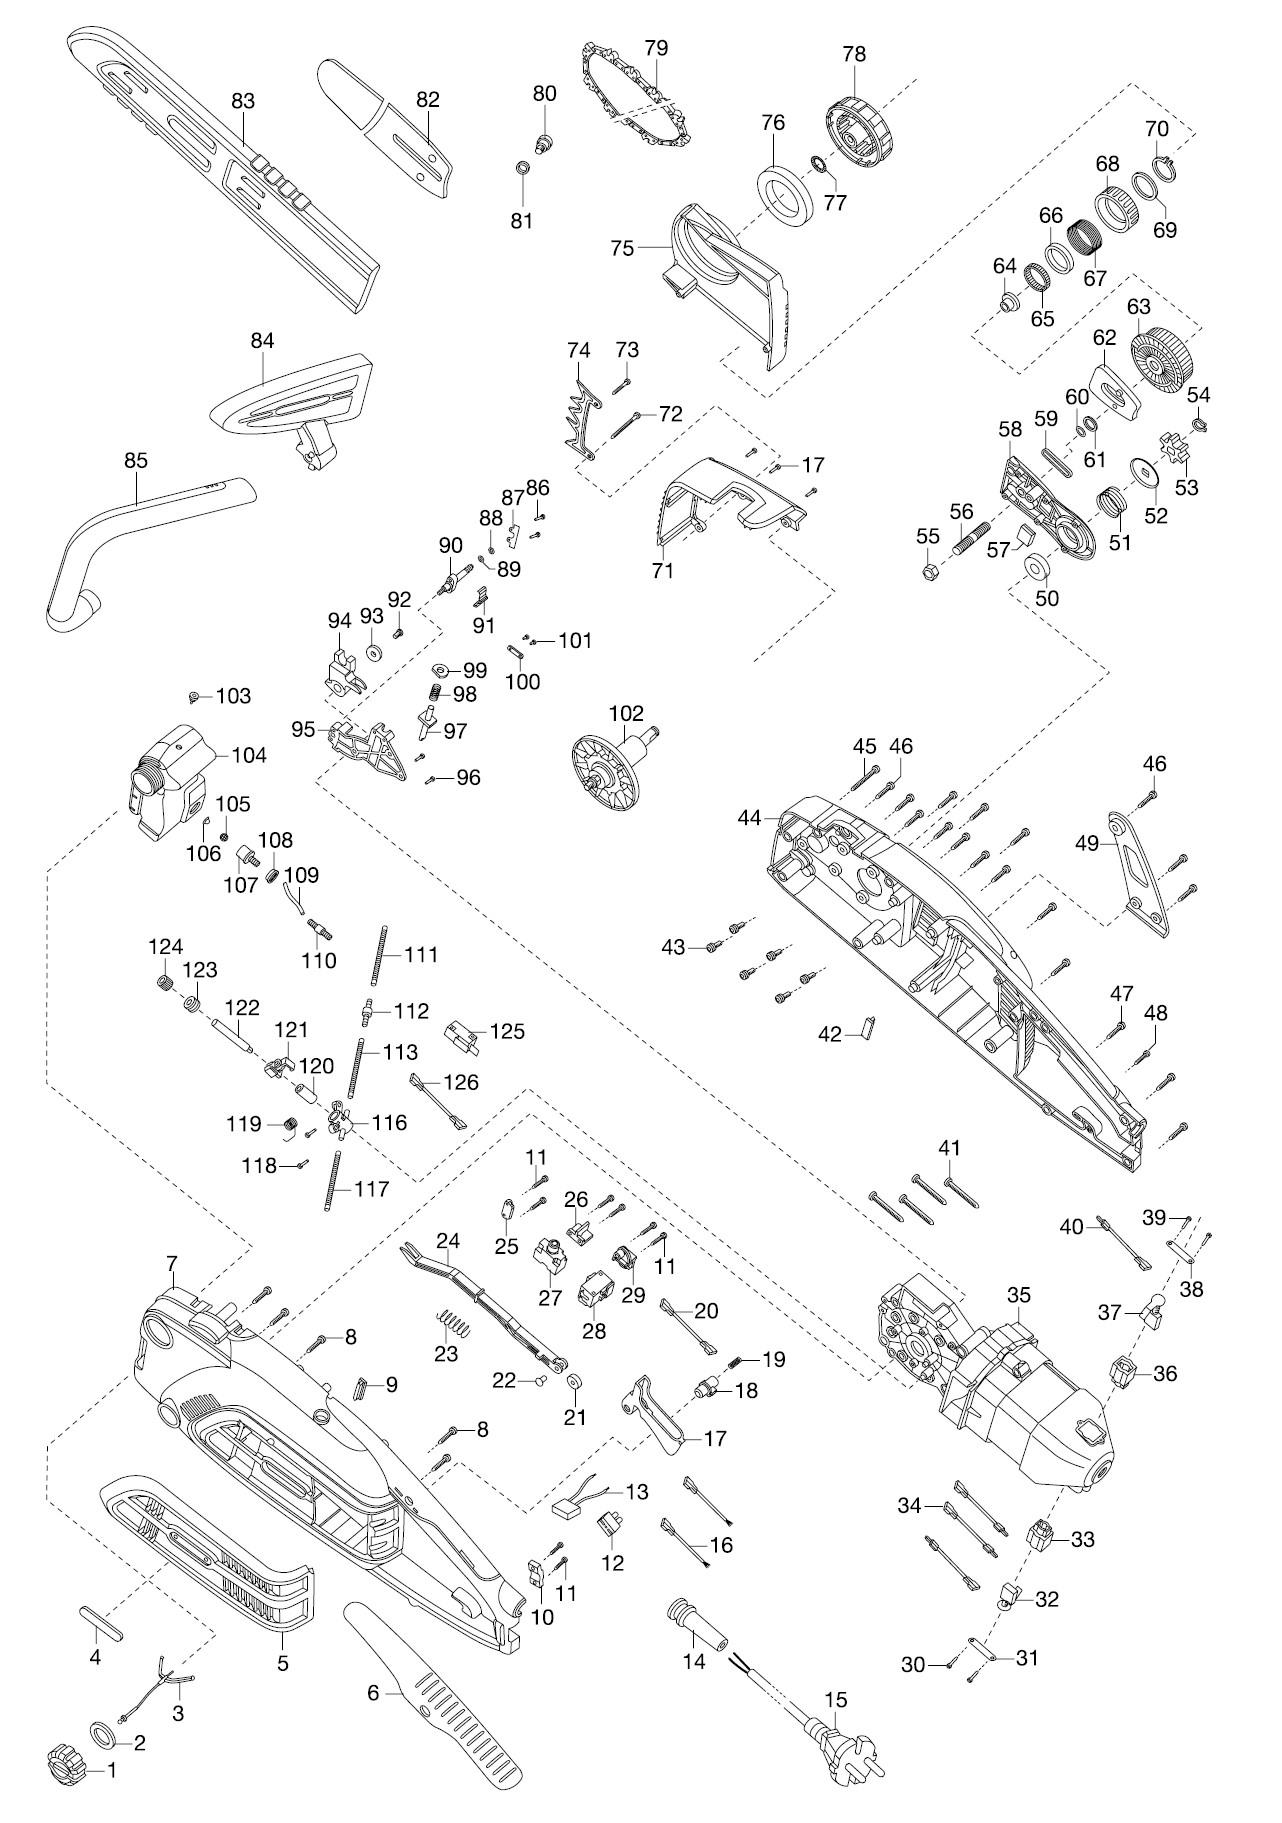 ersatzteile gardena elektro kettens ge csi 4020 x 8863 ersatzteil fee. Black Bedroom Furniture Sets. Home Design Ideas